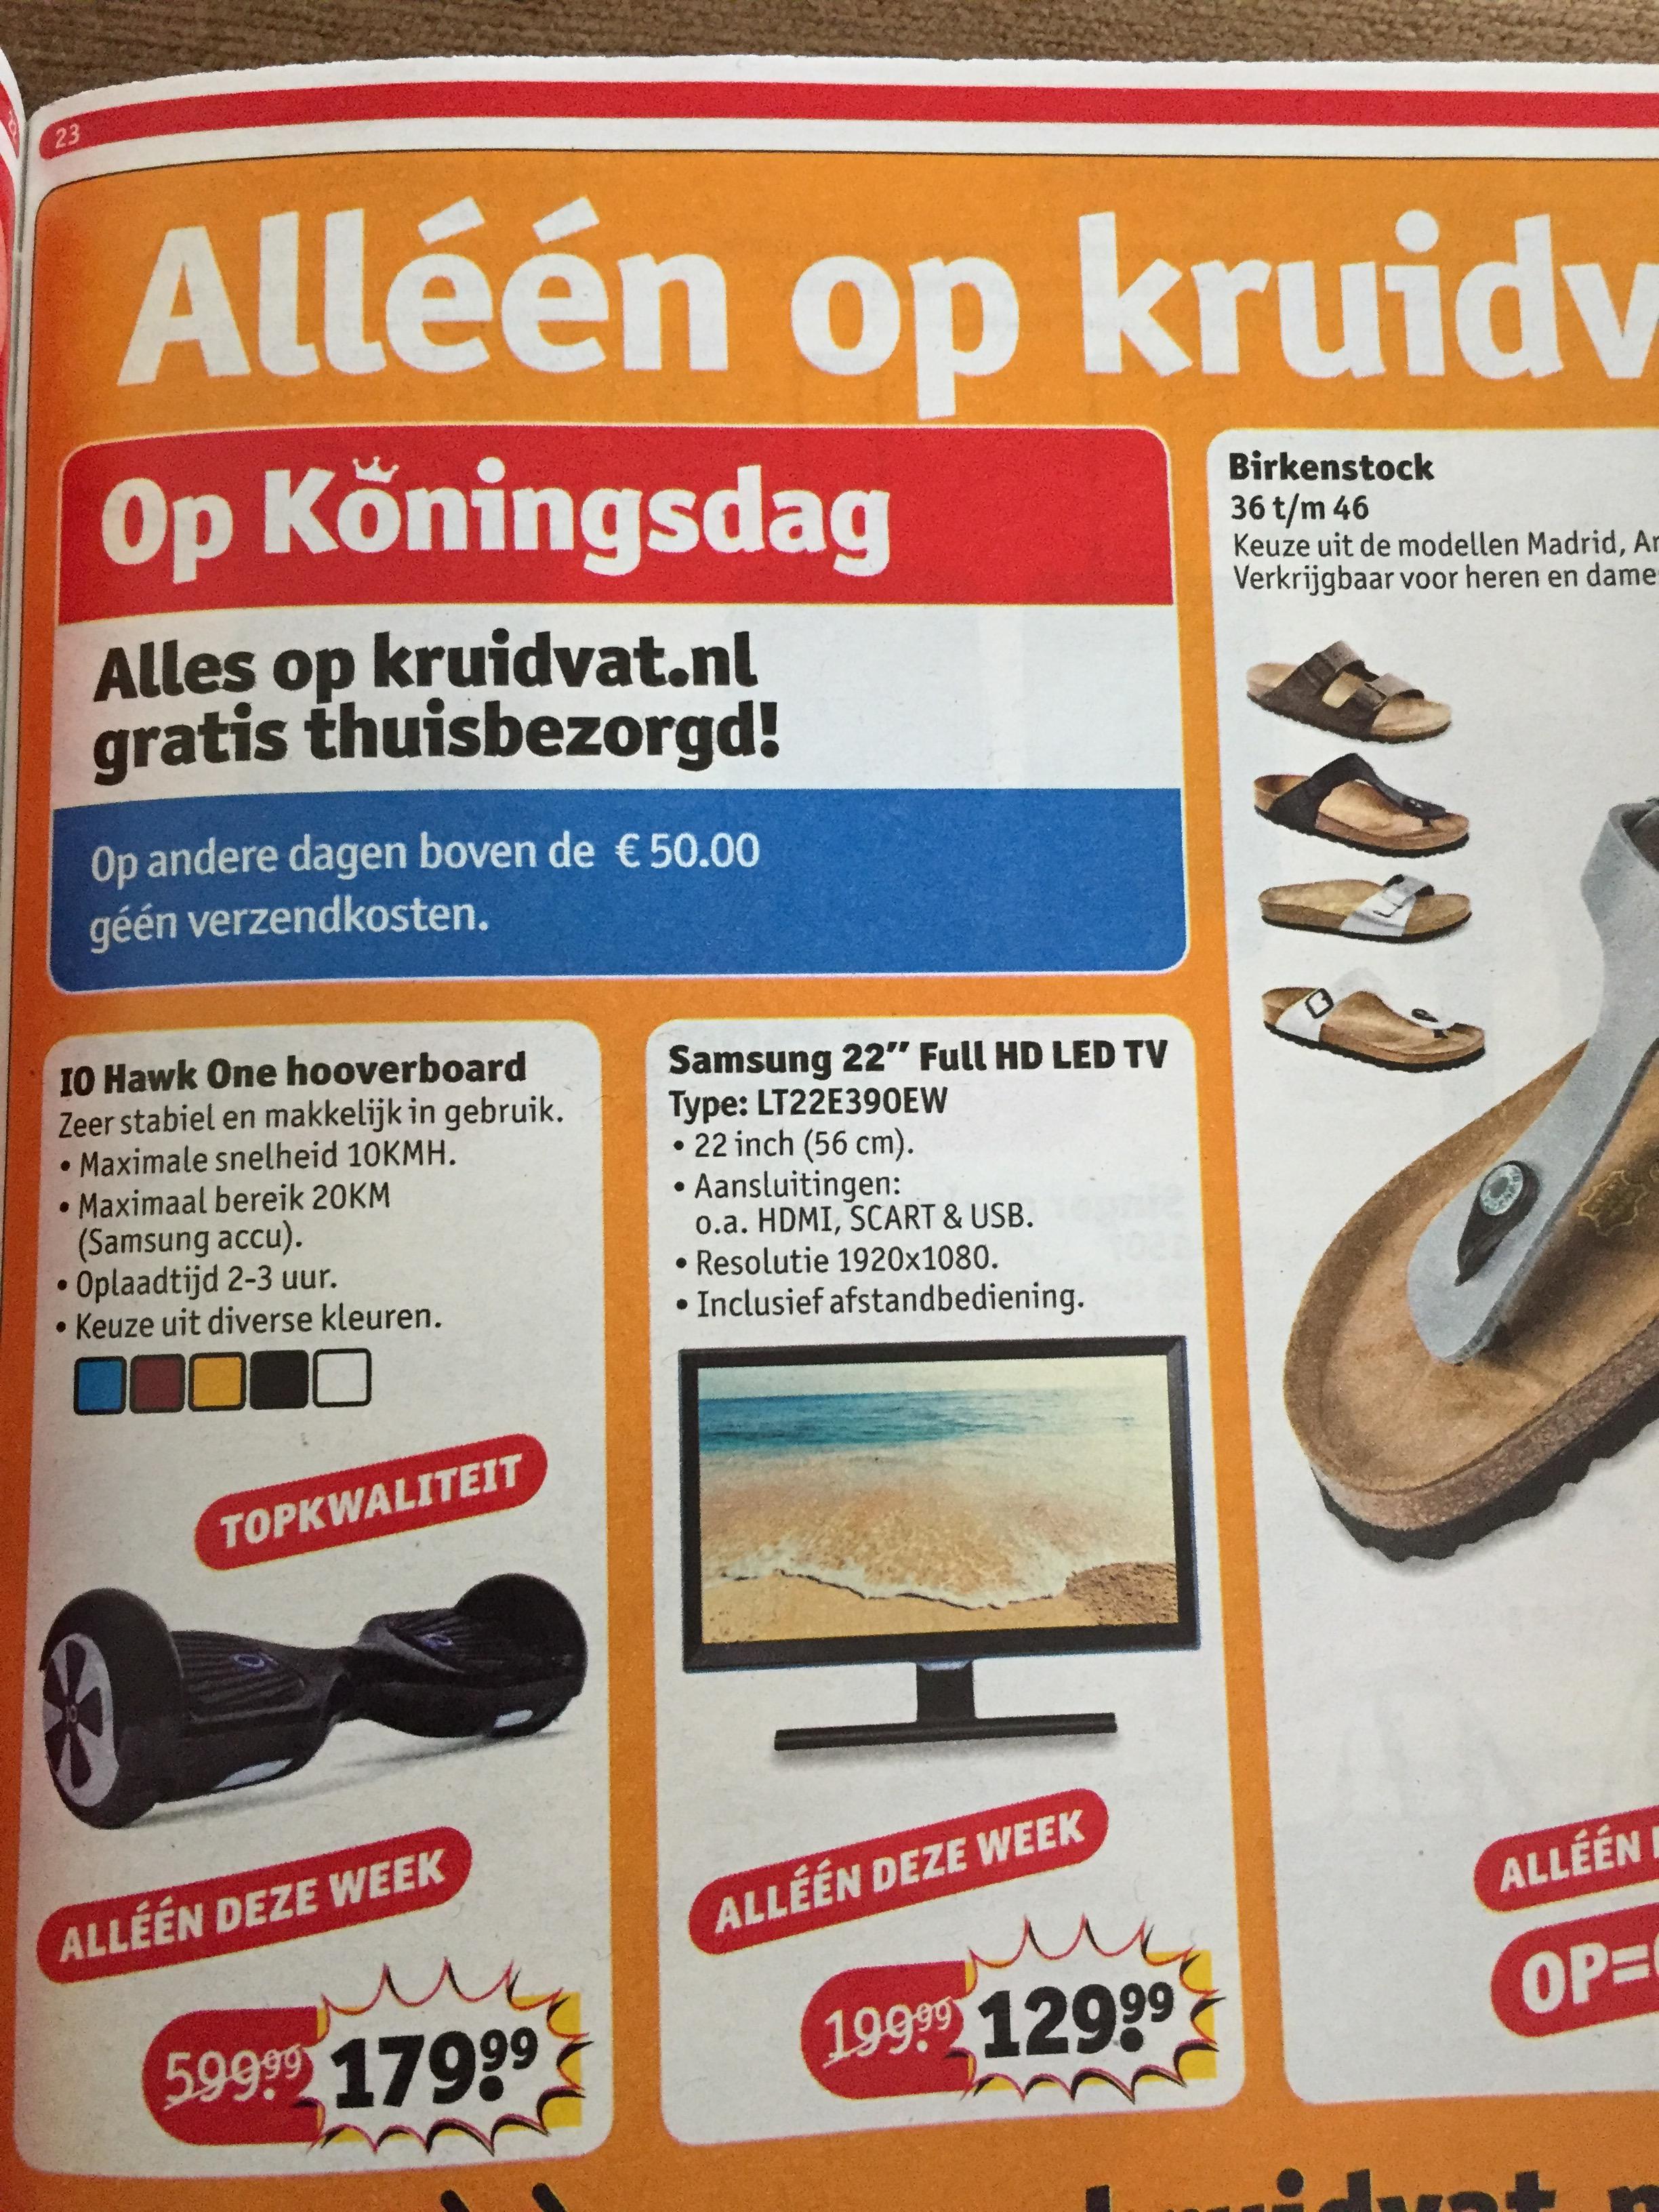 Geen bezorgkosten op koningsdag @ Kruidvat